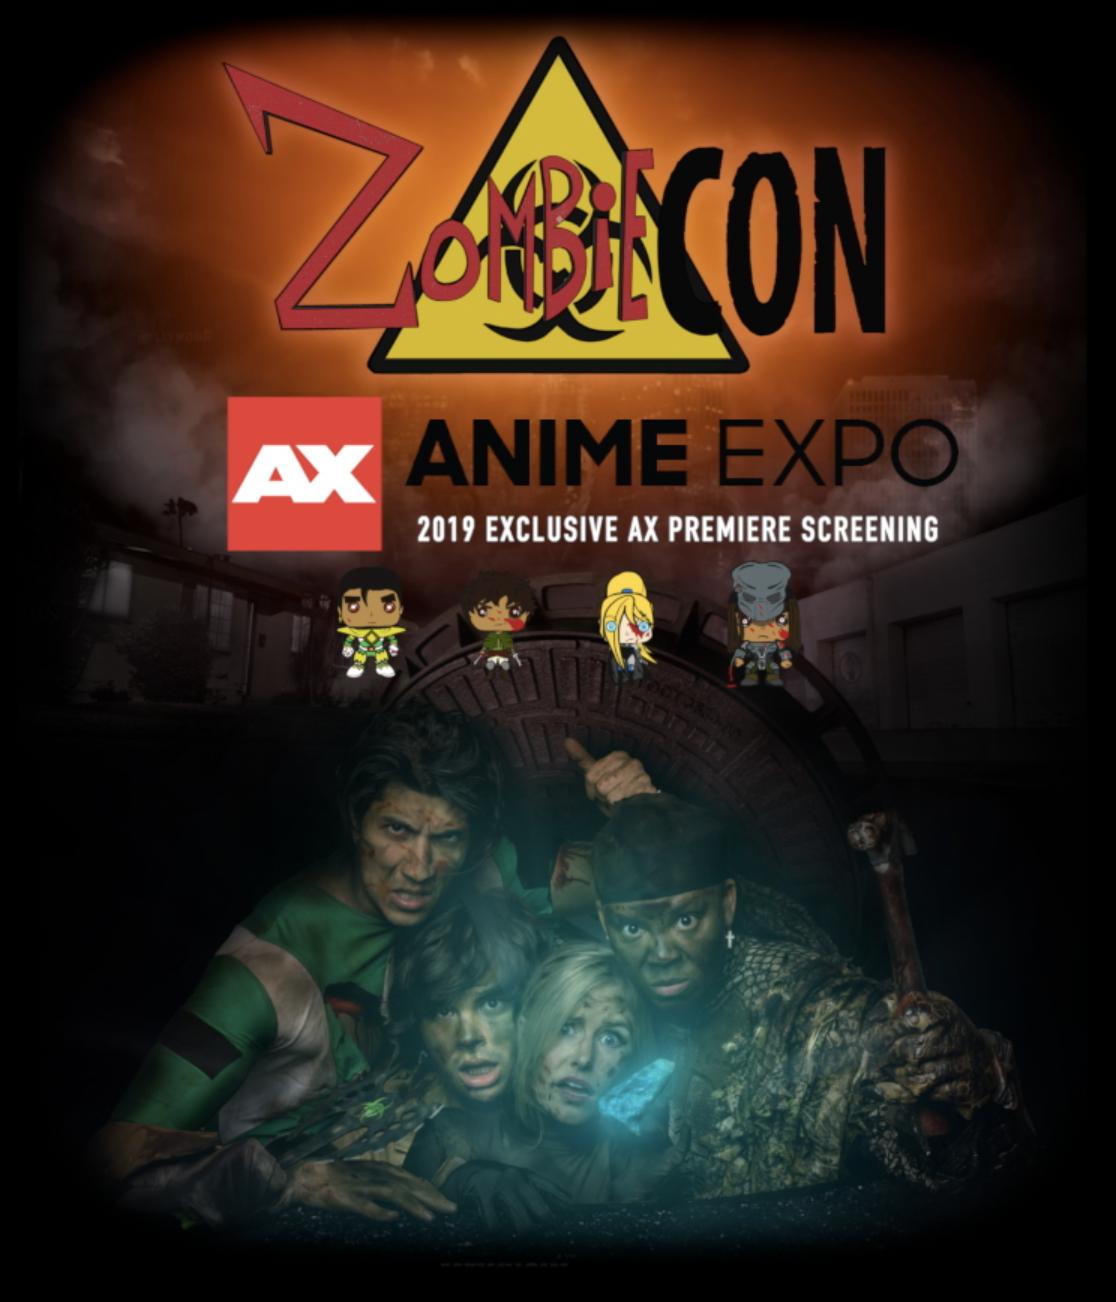 zombiecon AX Anime Expo 2019 INSTA TWITTER Announcement